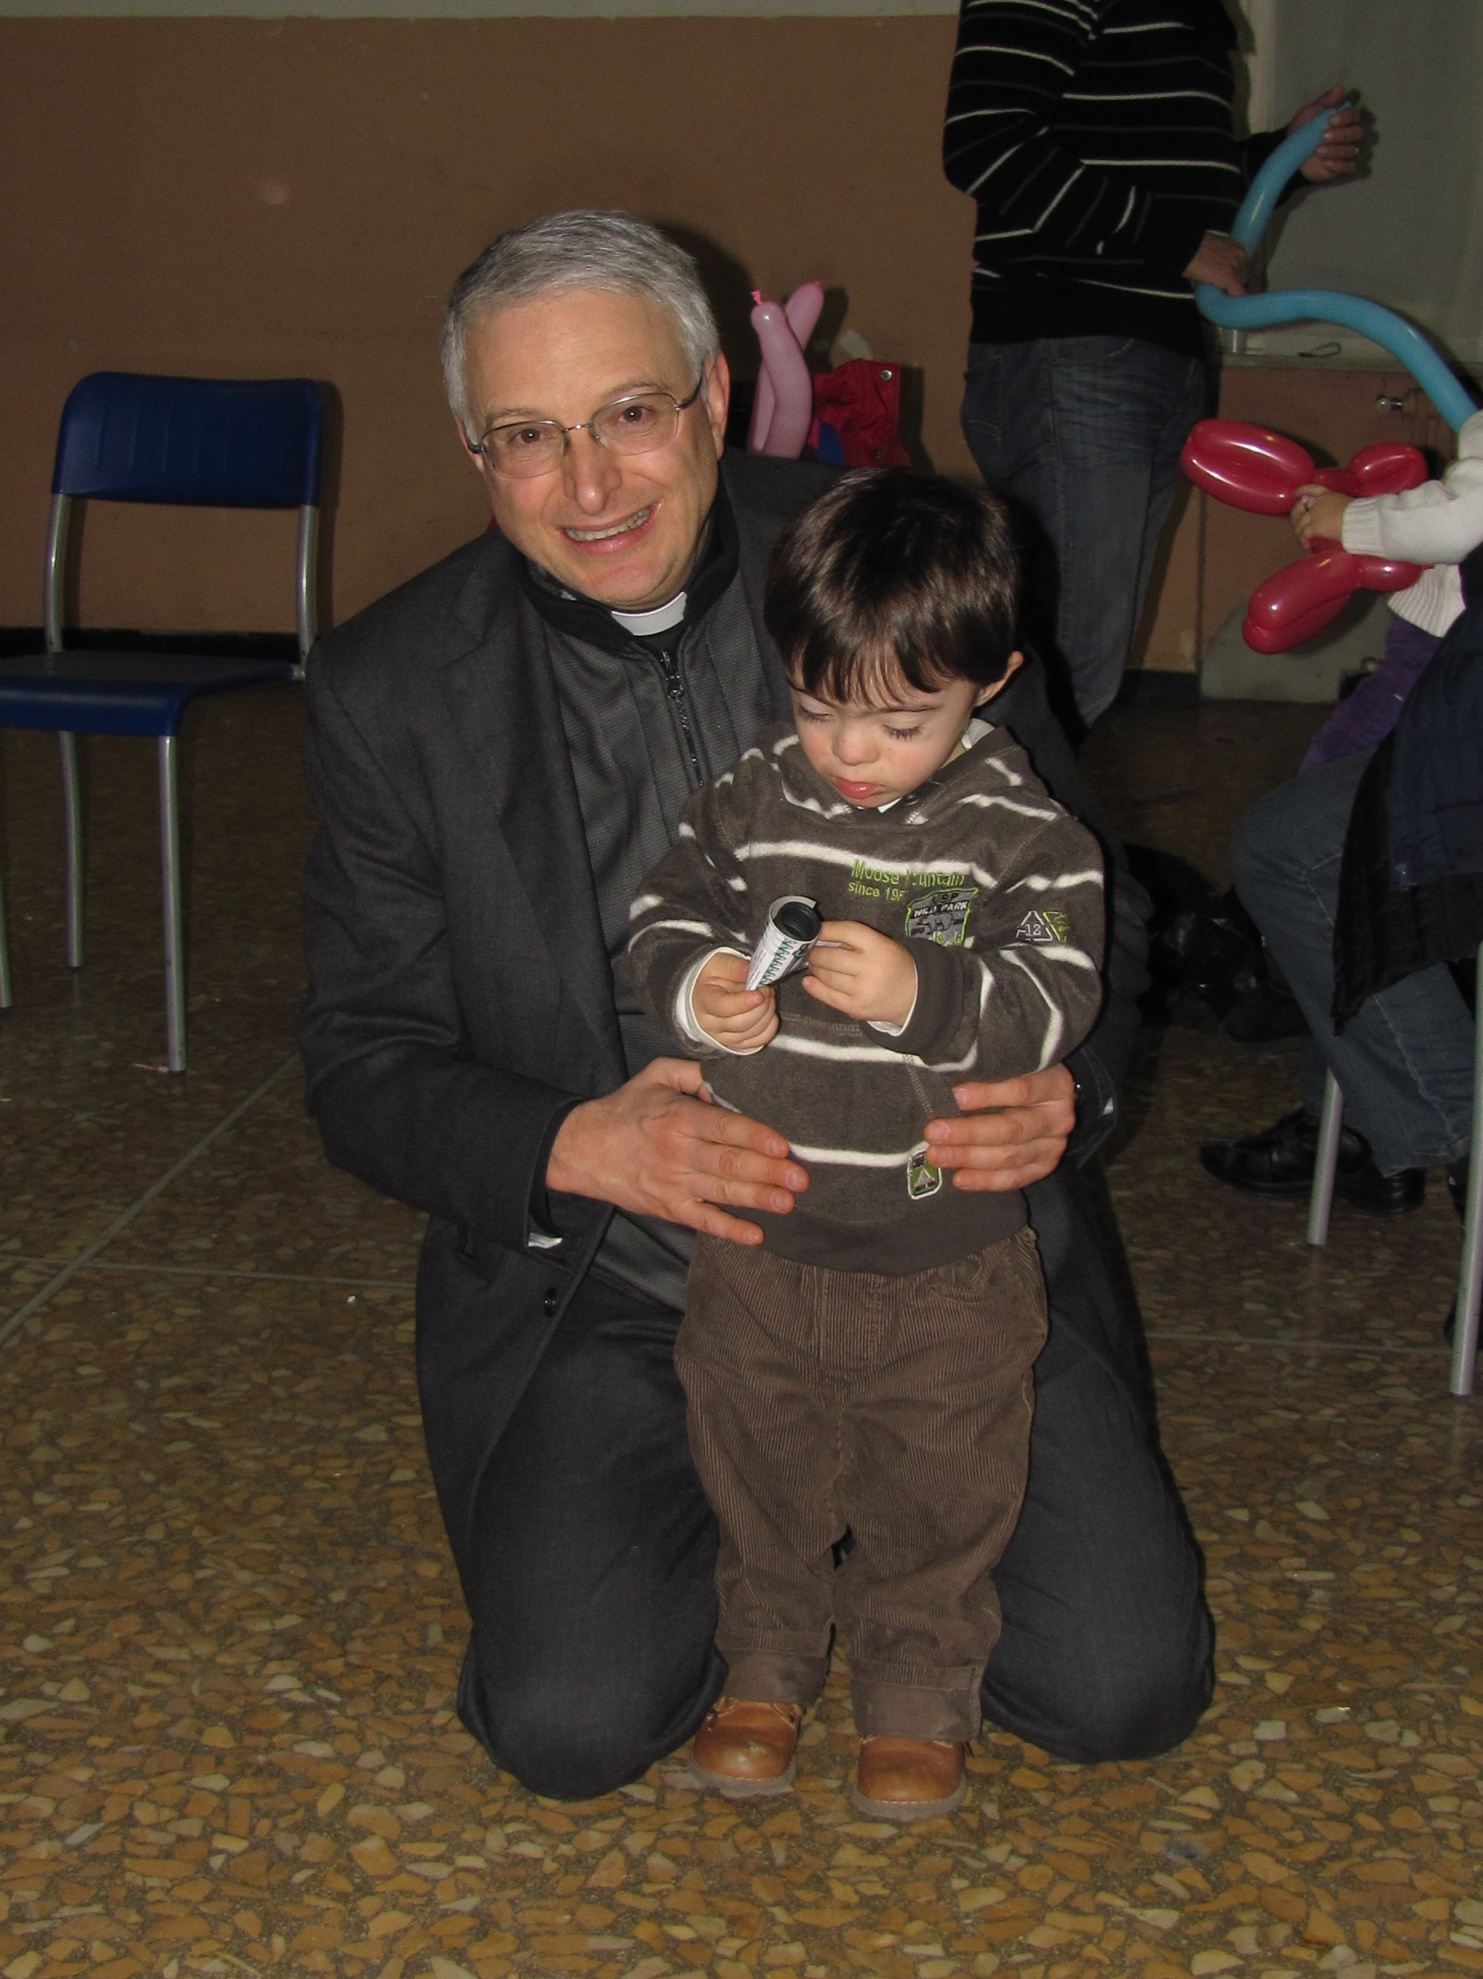 ricordo_battesimo_gesu_2011-01-23-17-36-45